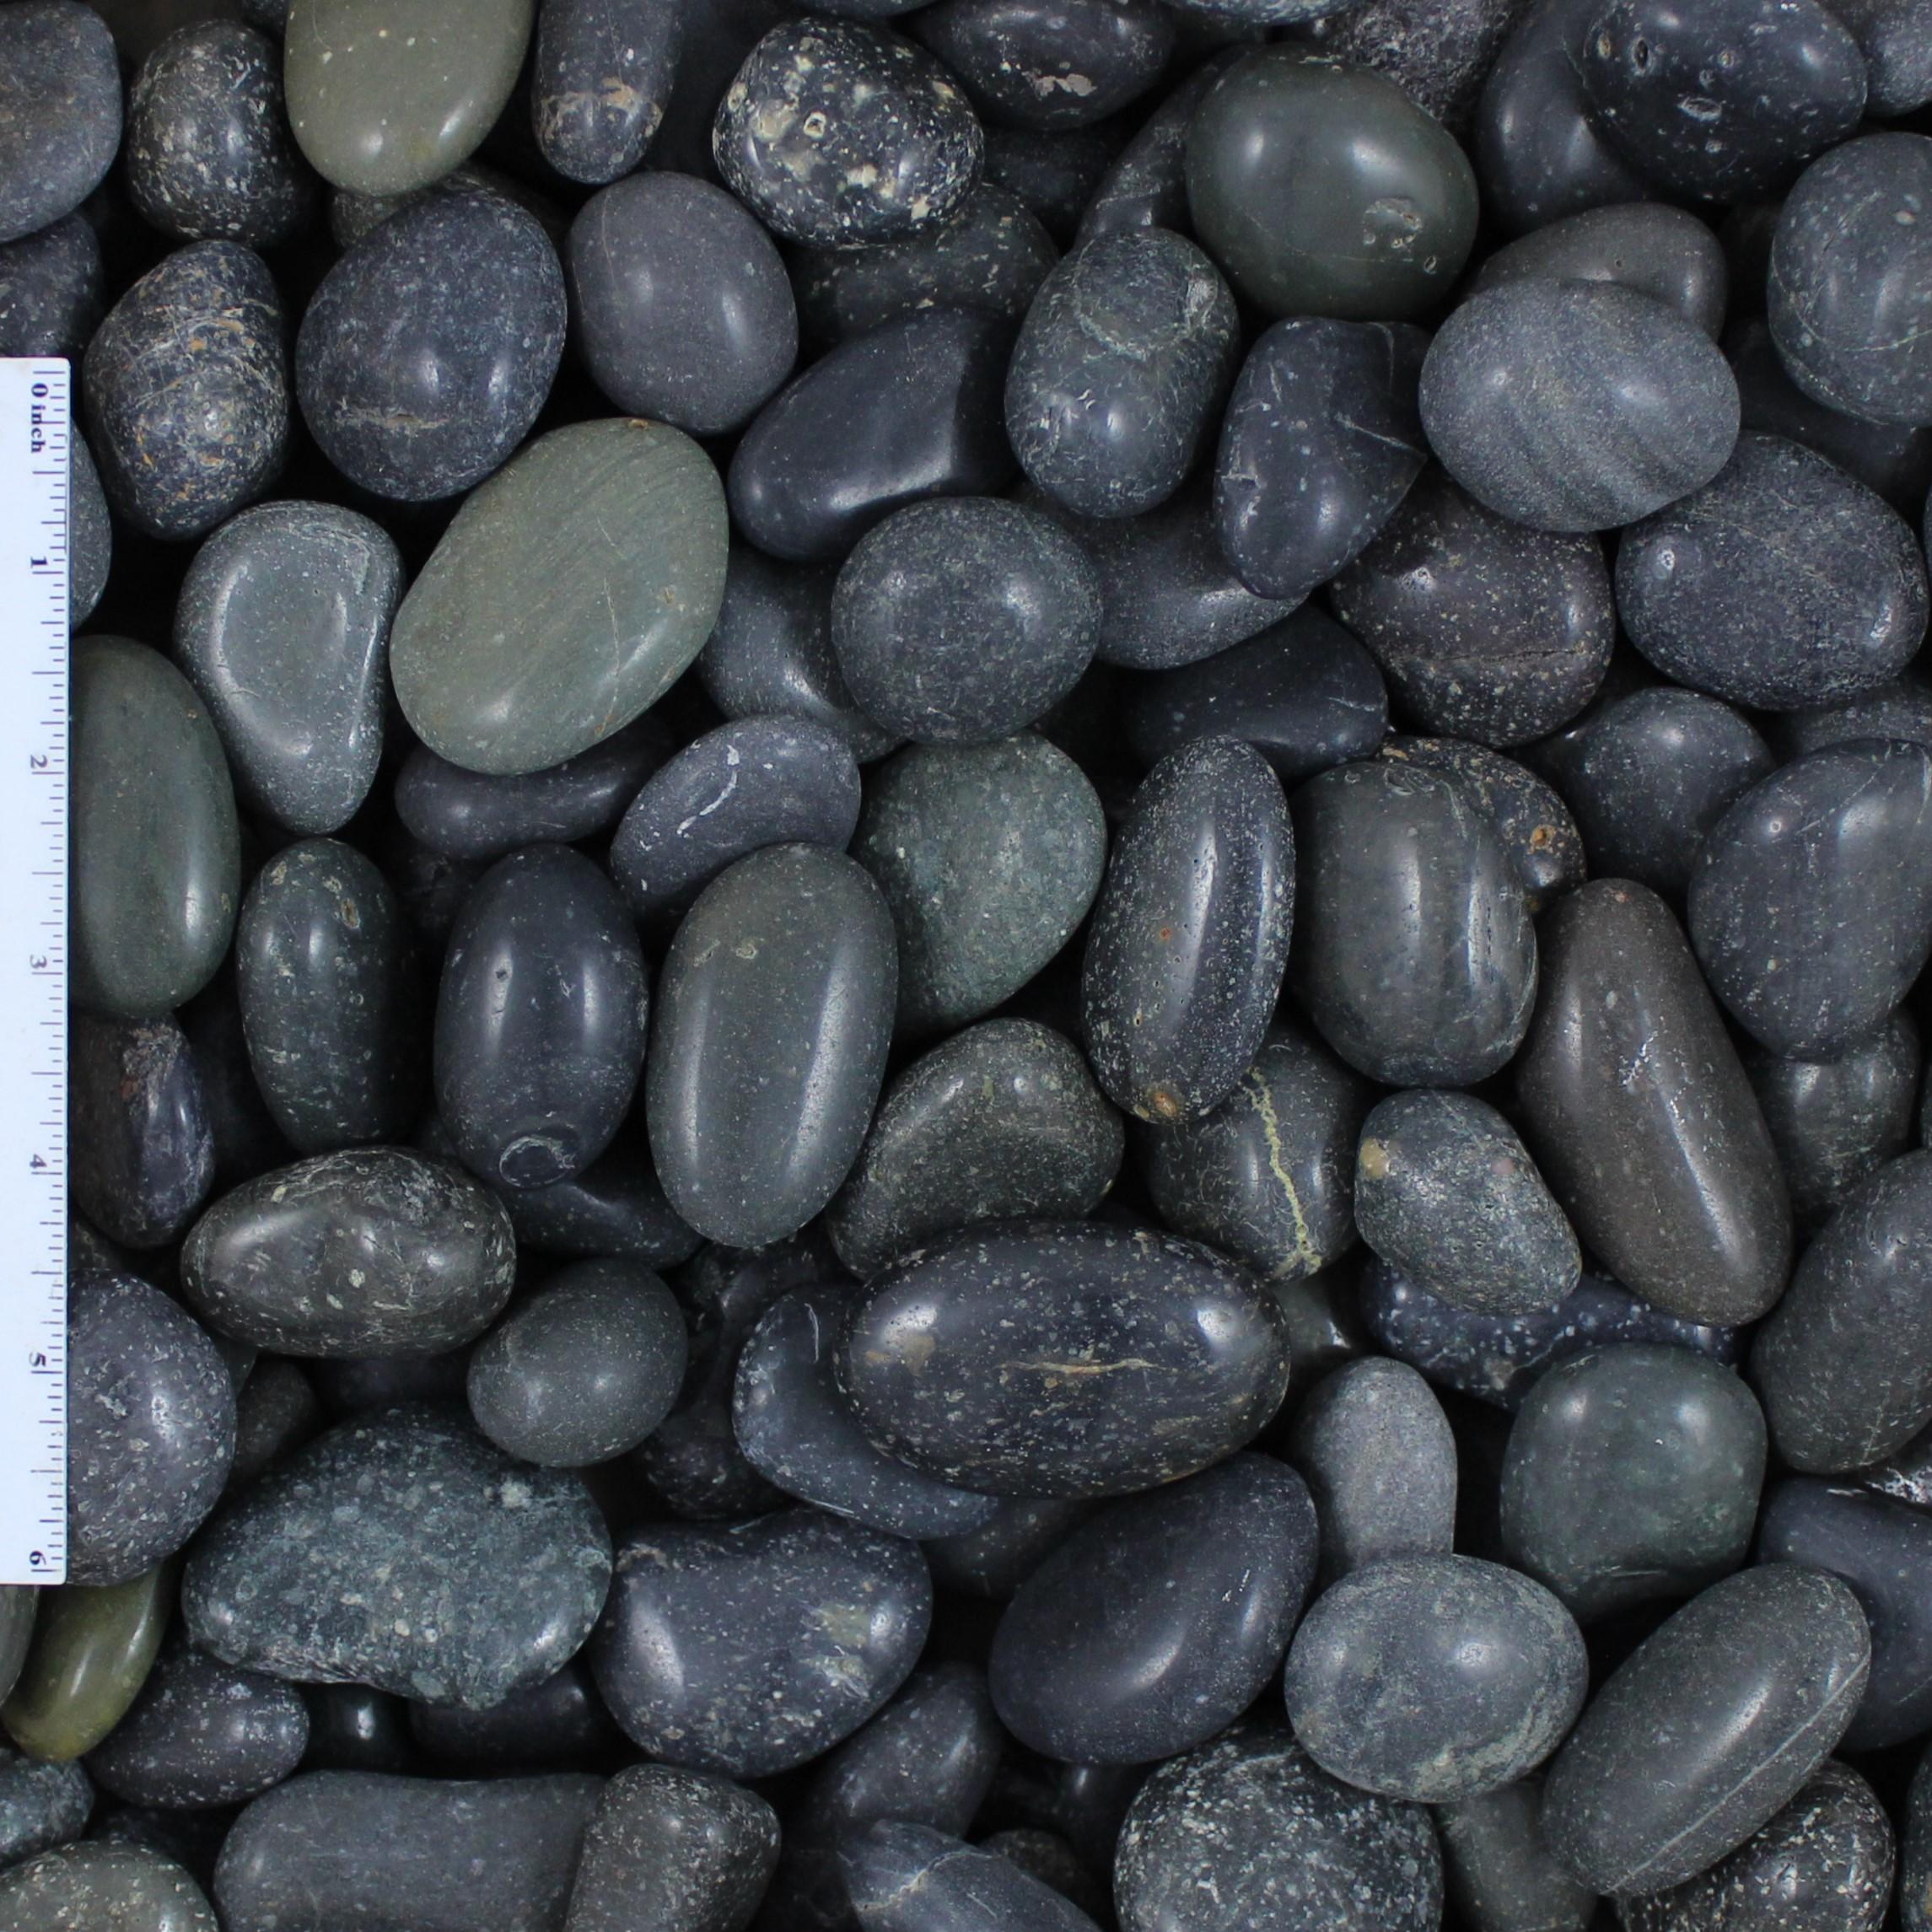 Polished Black Mexican Beach Pebbles